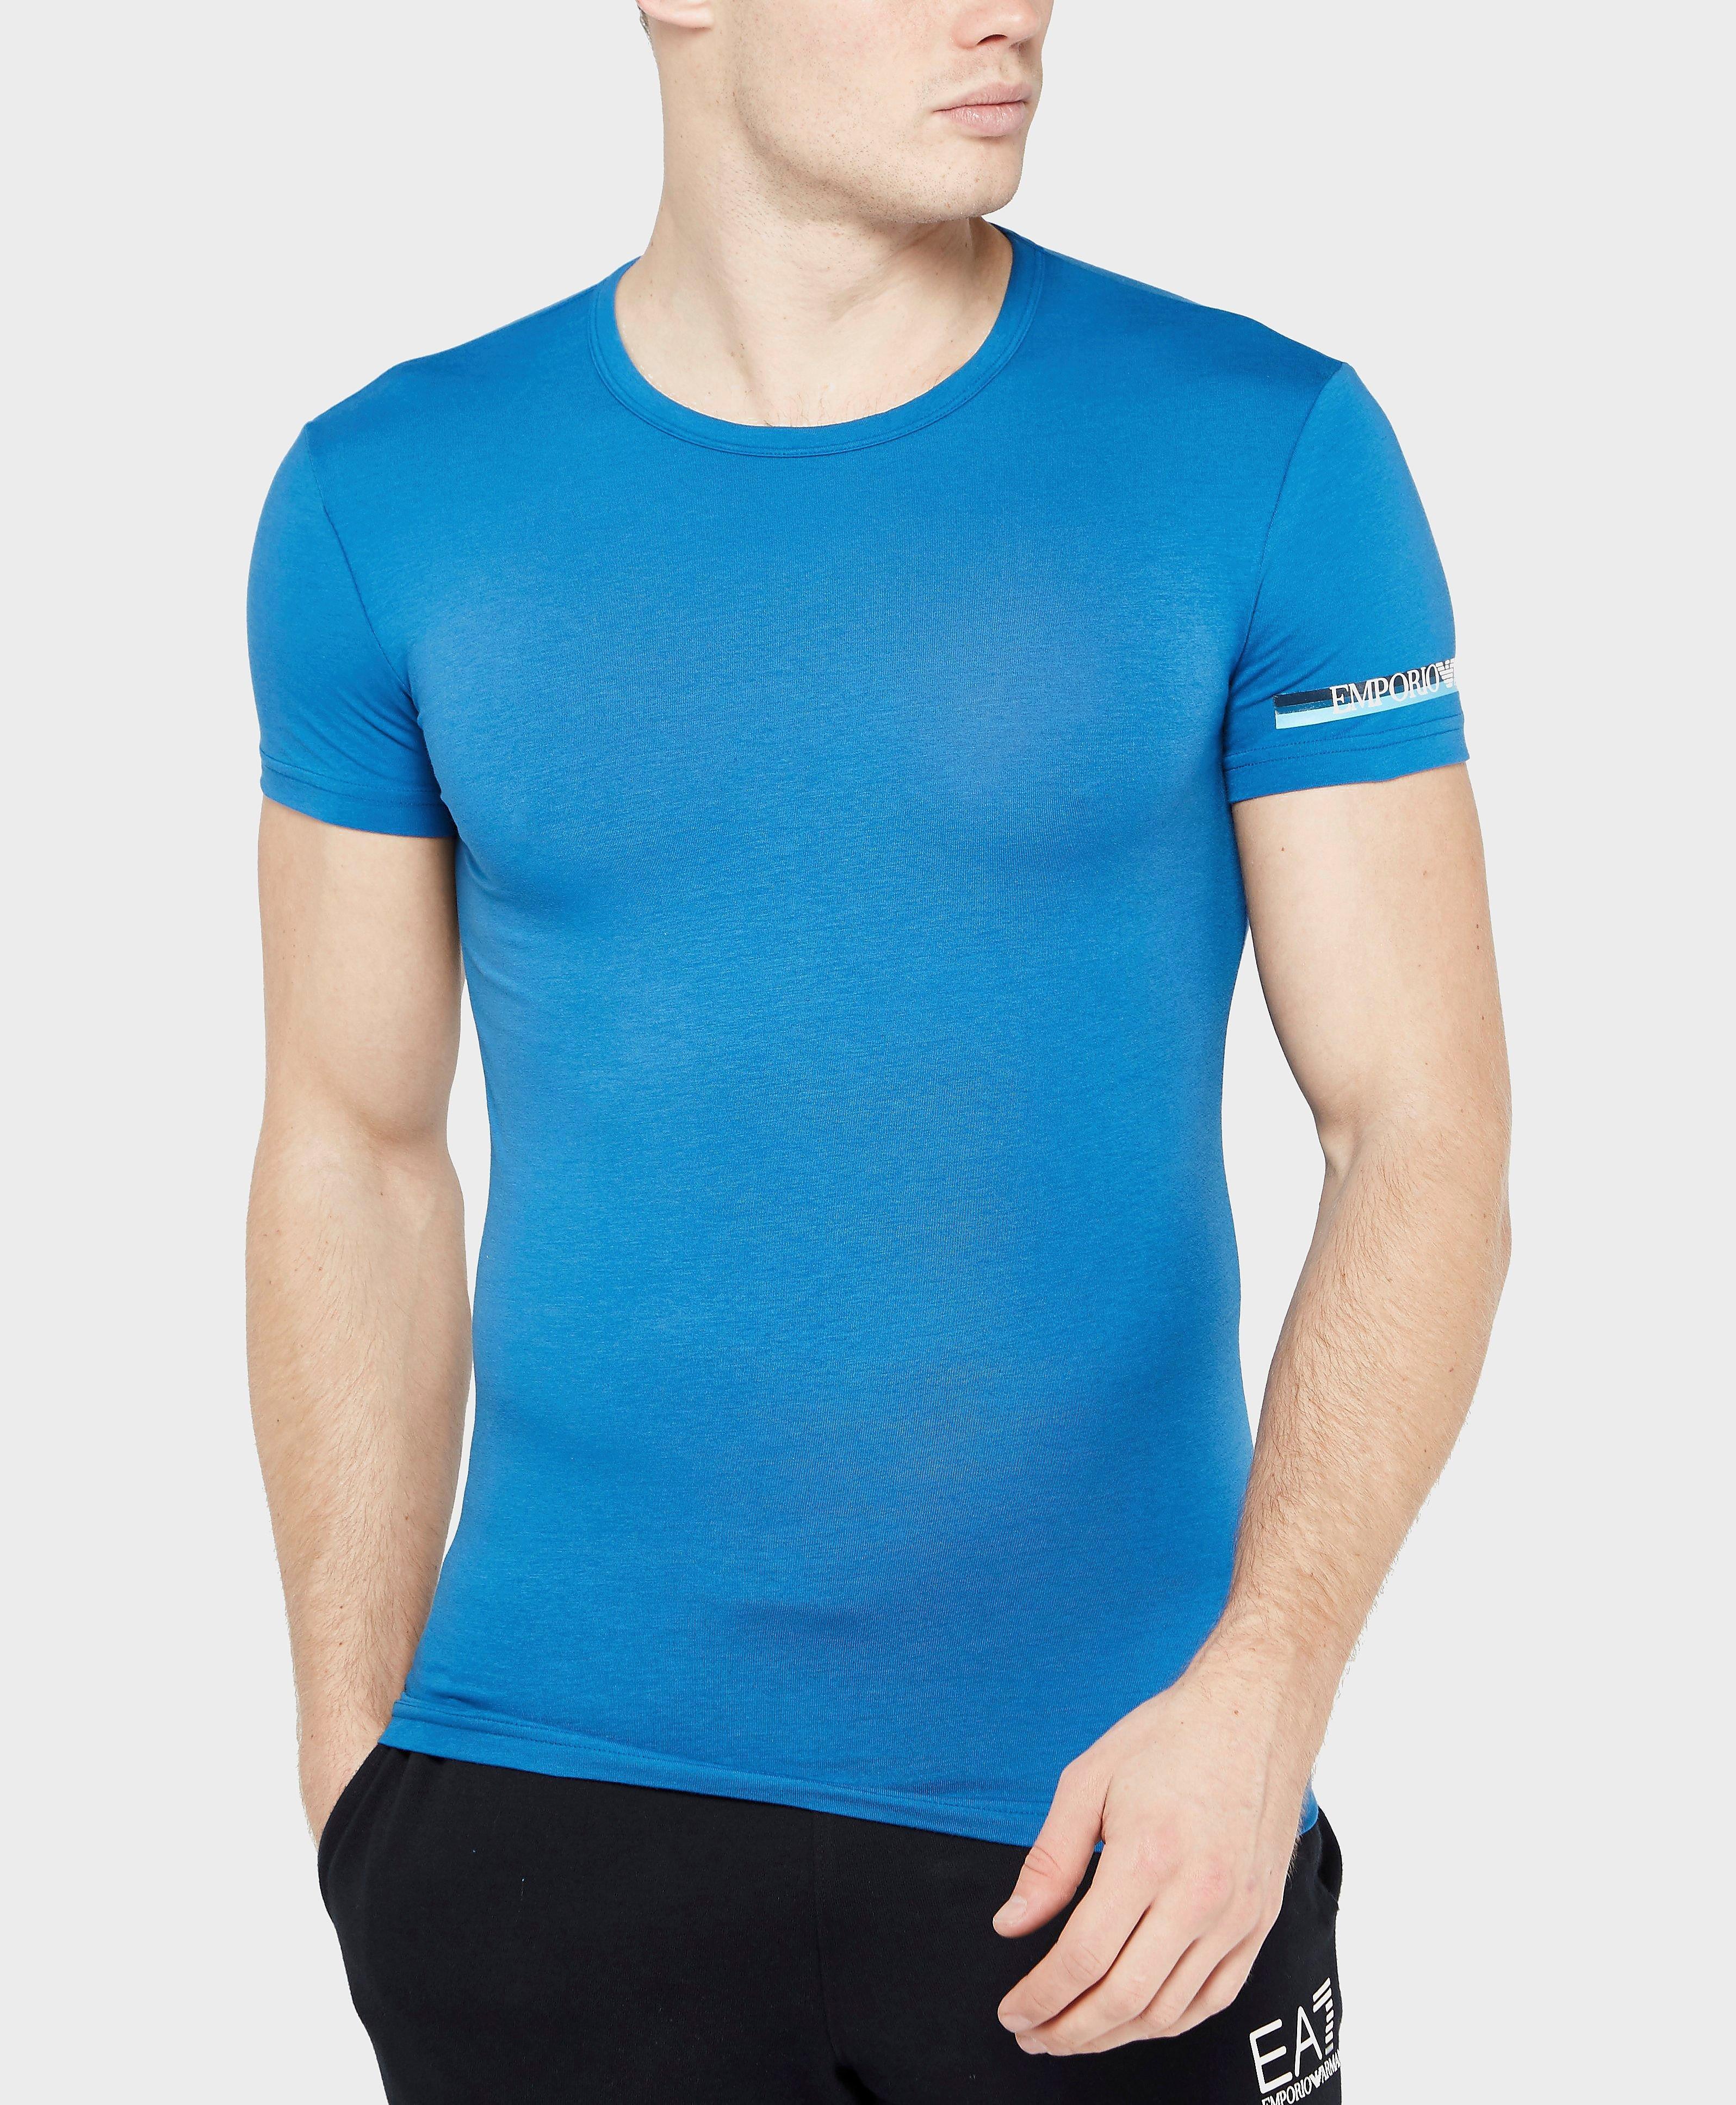 Emporio Armani Sleeve Brand T-Shirt